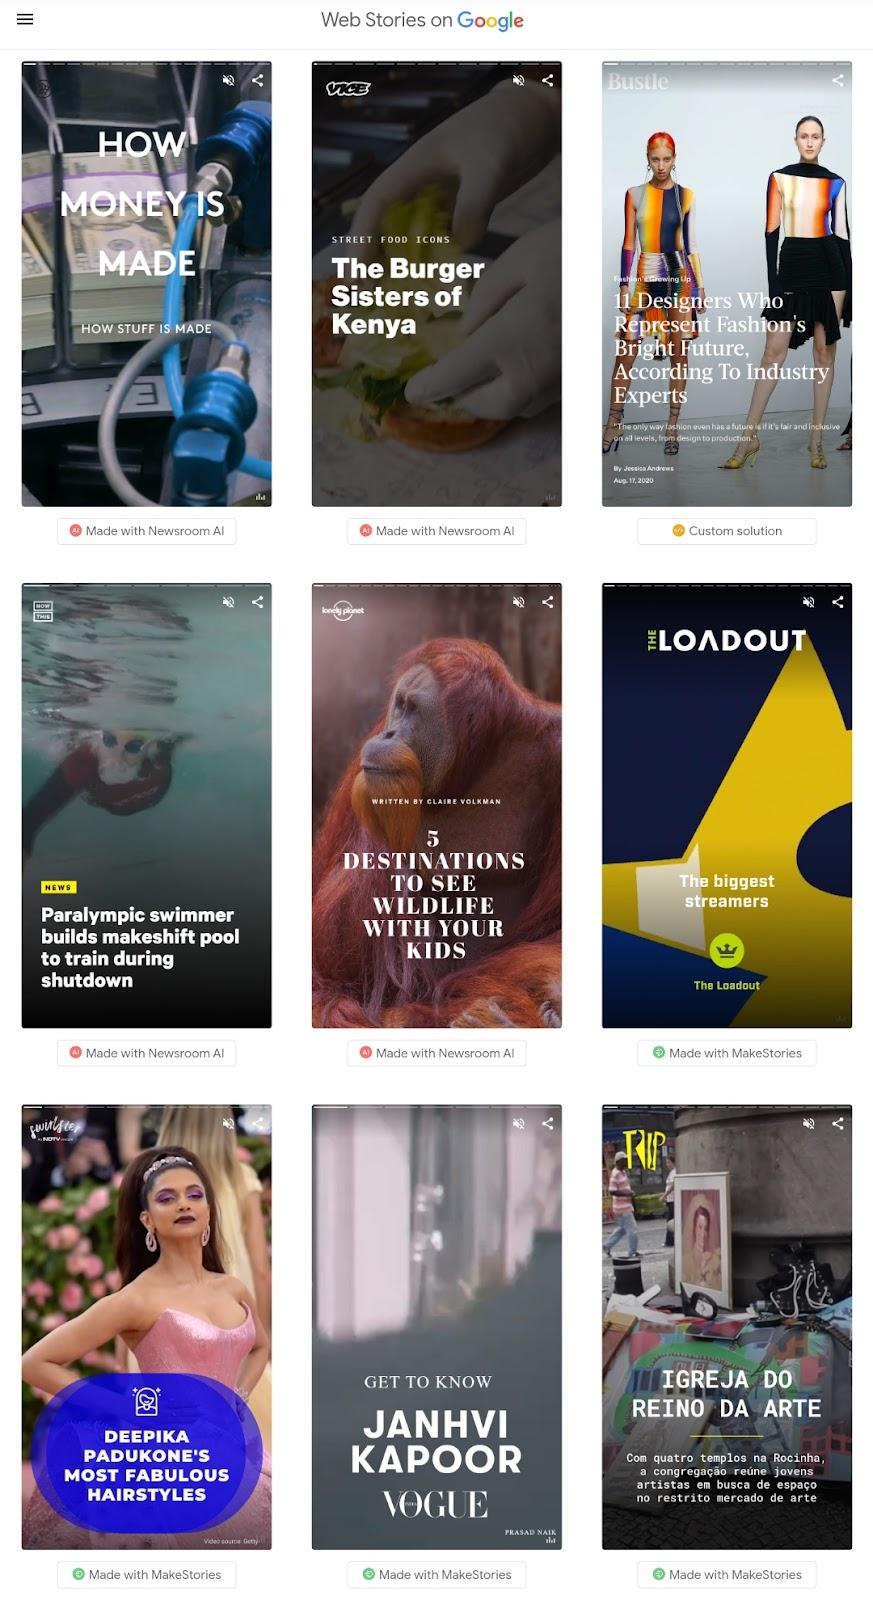 Different Web Stories displays